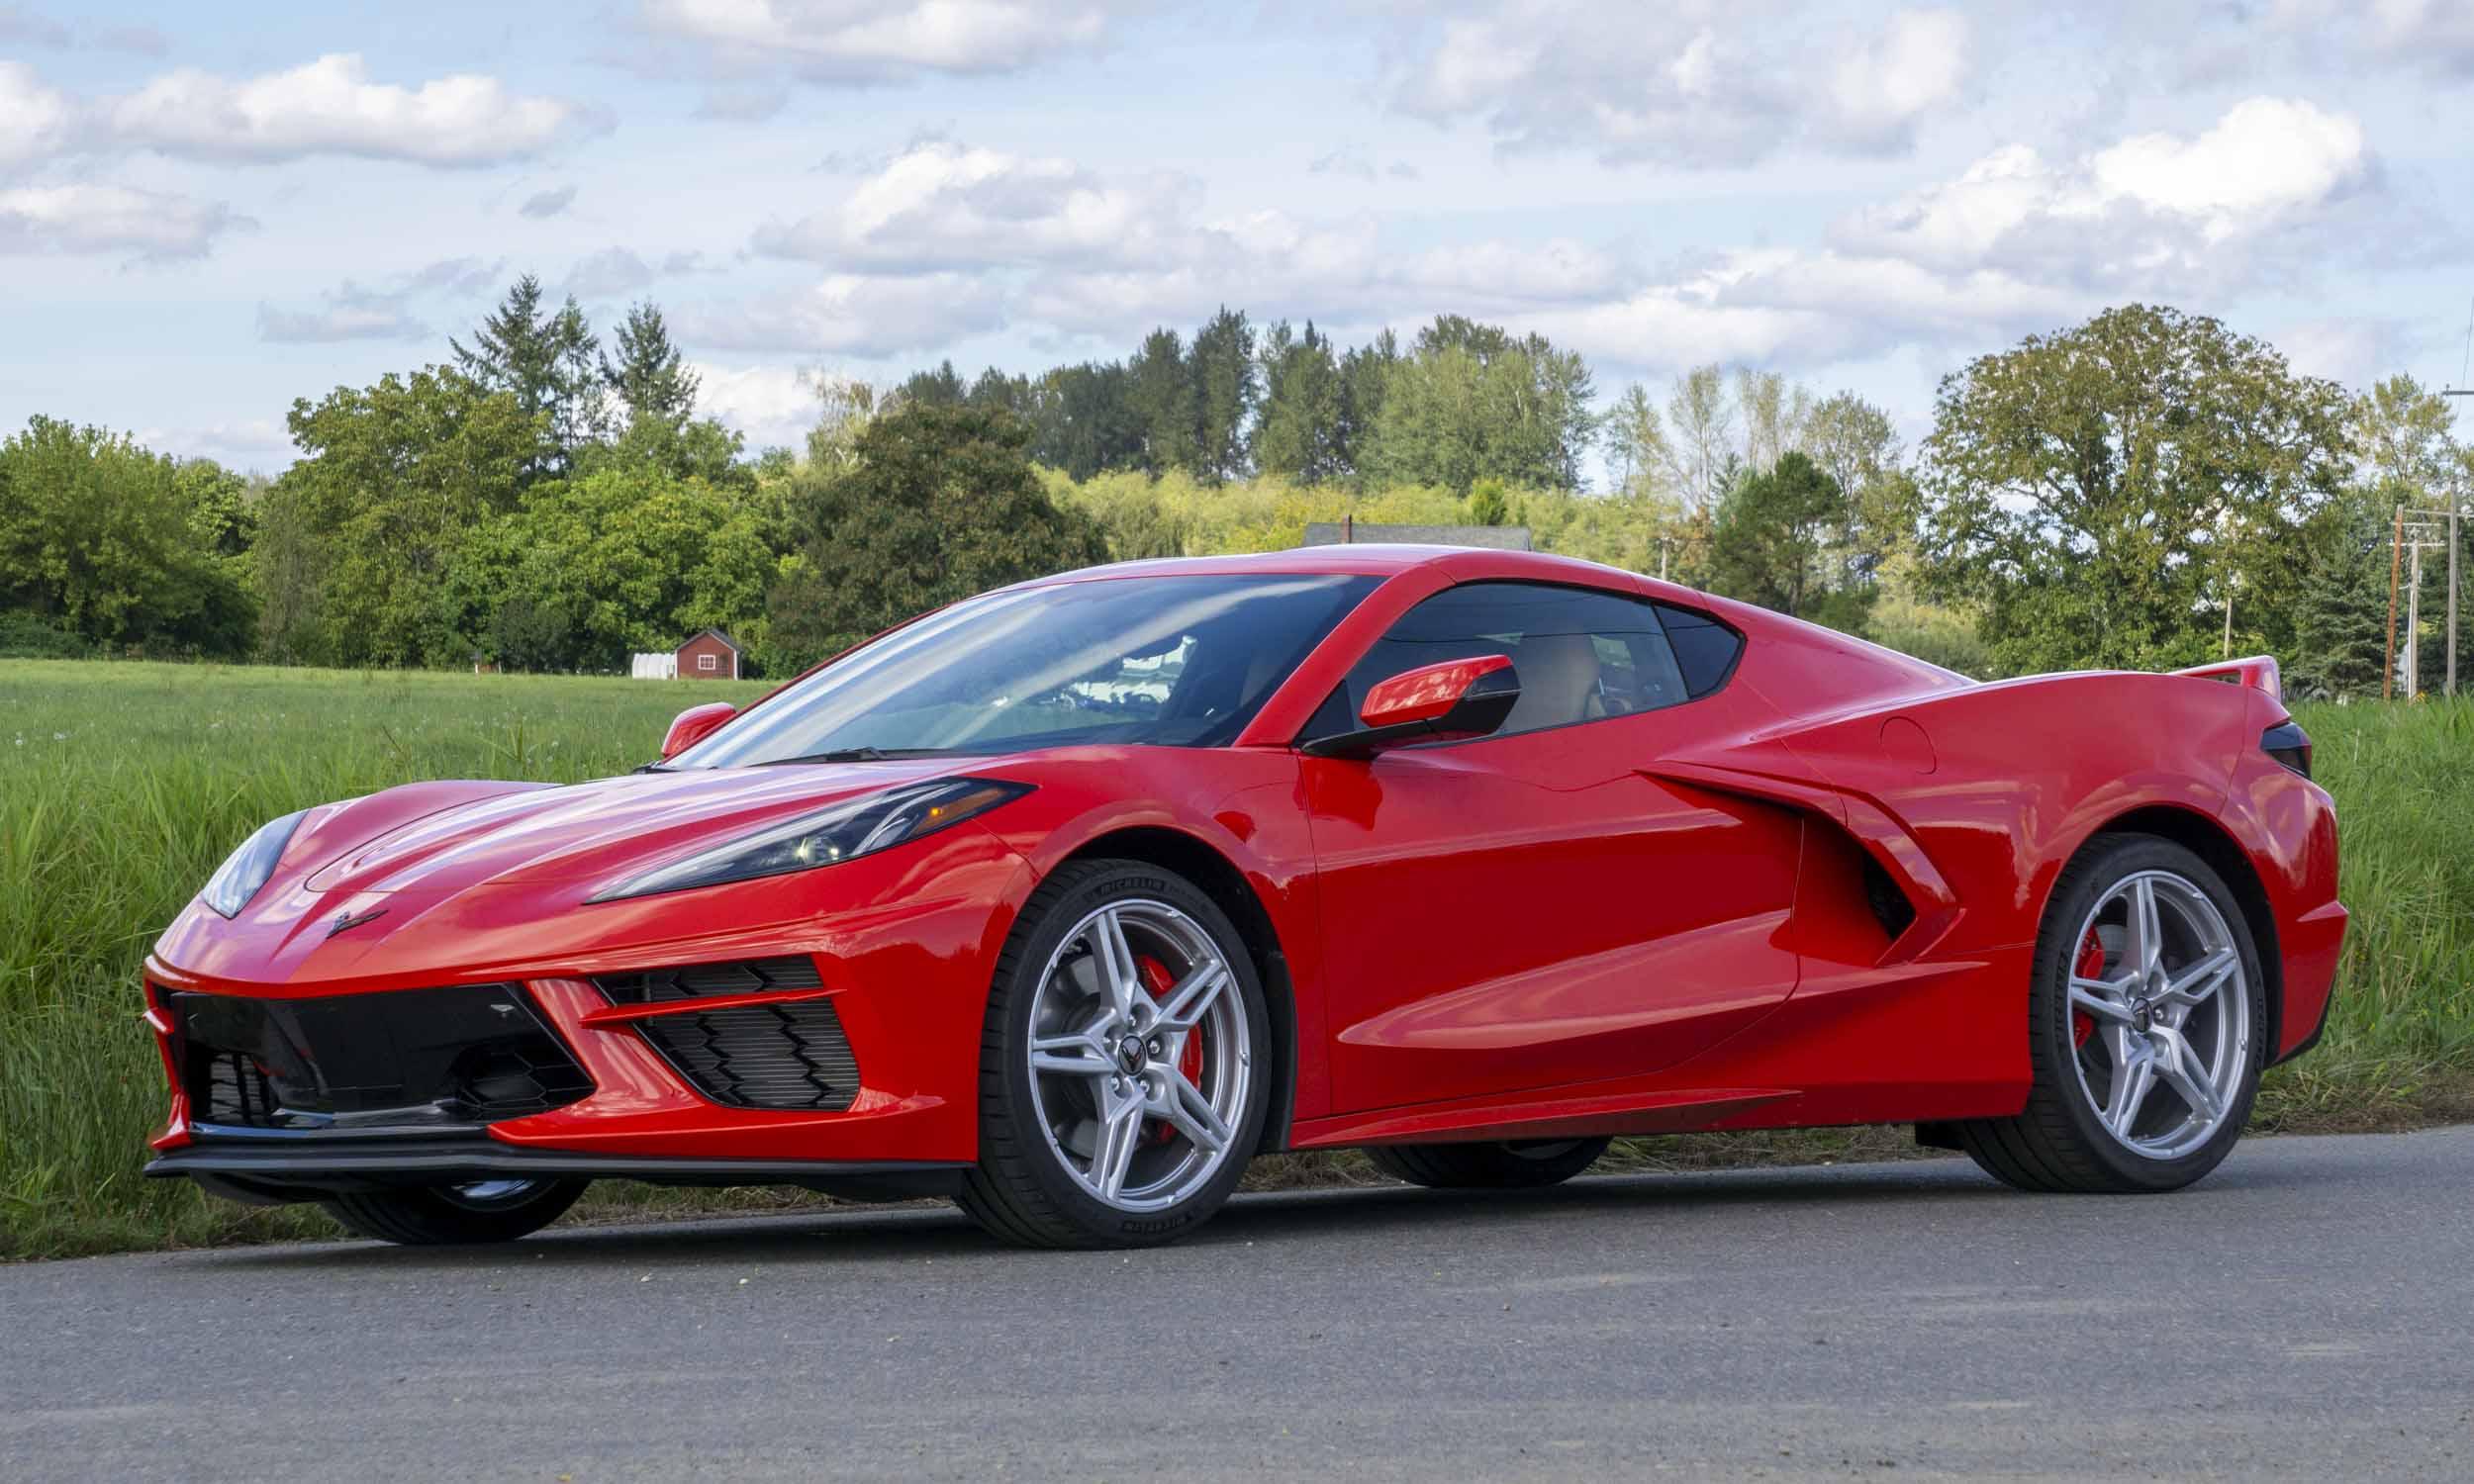 2020 Chevrolet Corvette Stingray Reviewnbsp